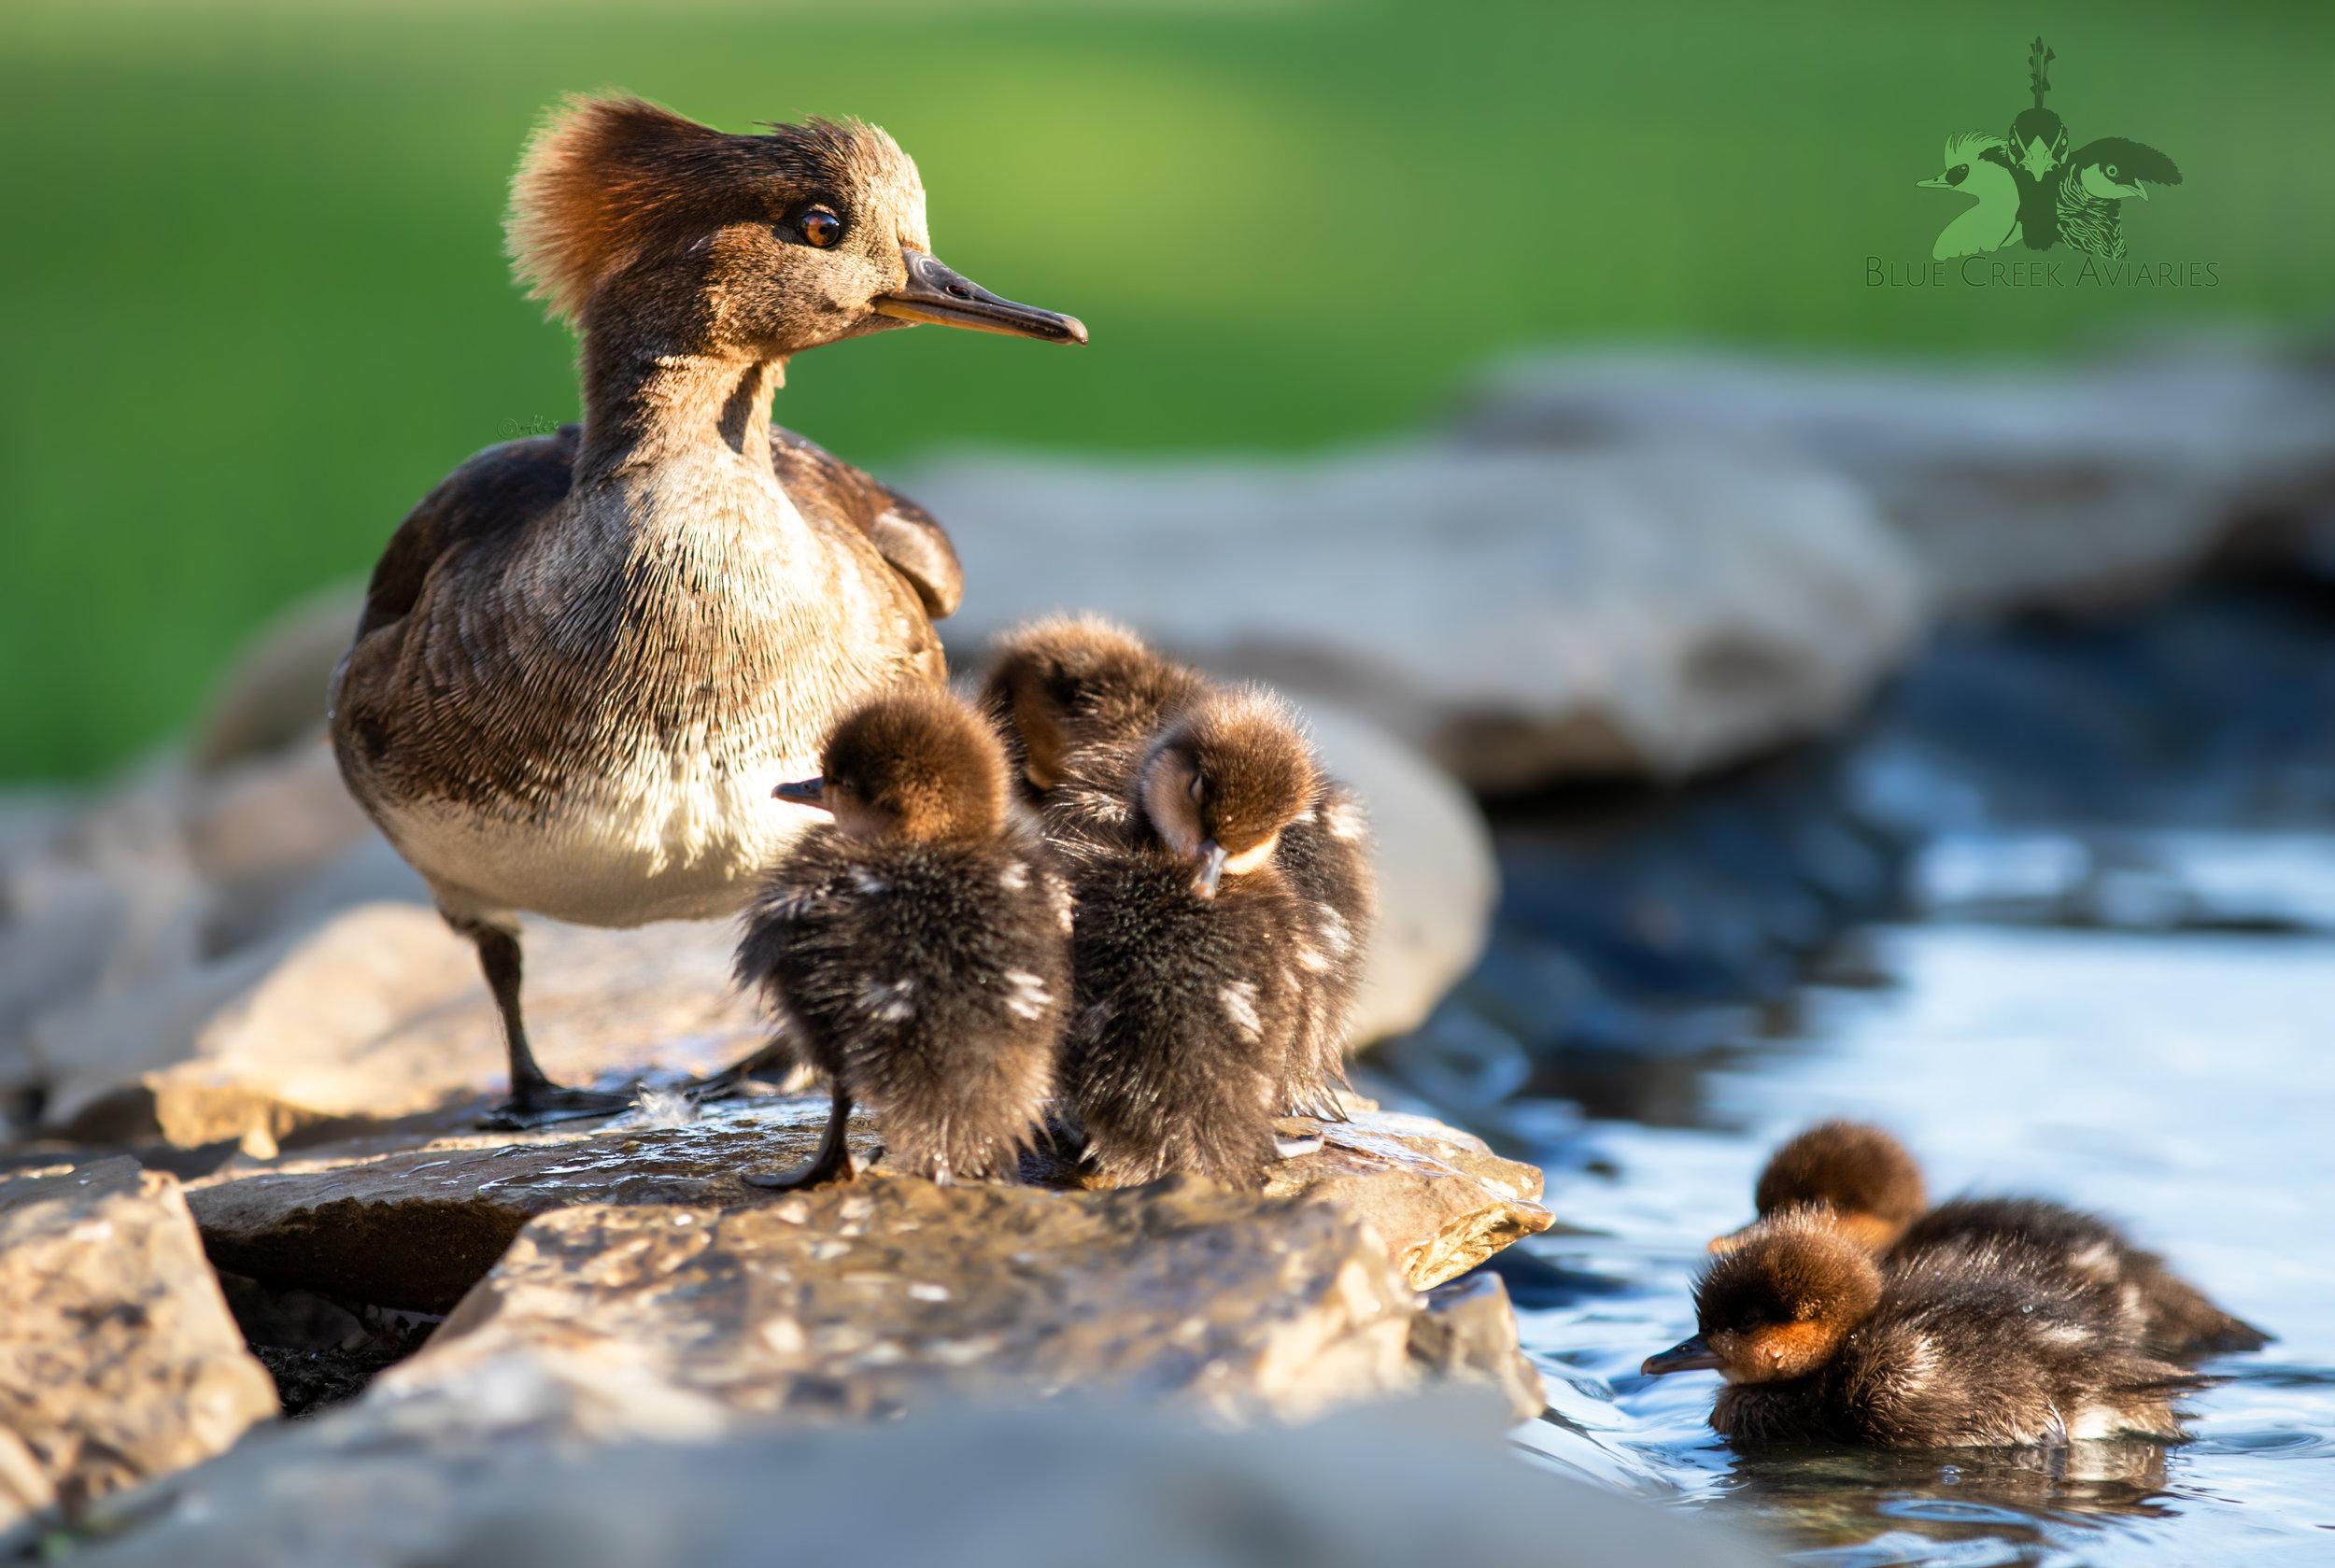 Hooded Merganser with ducklings